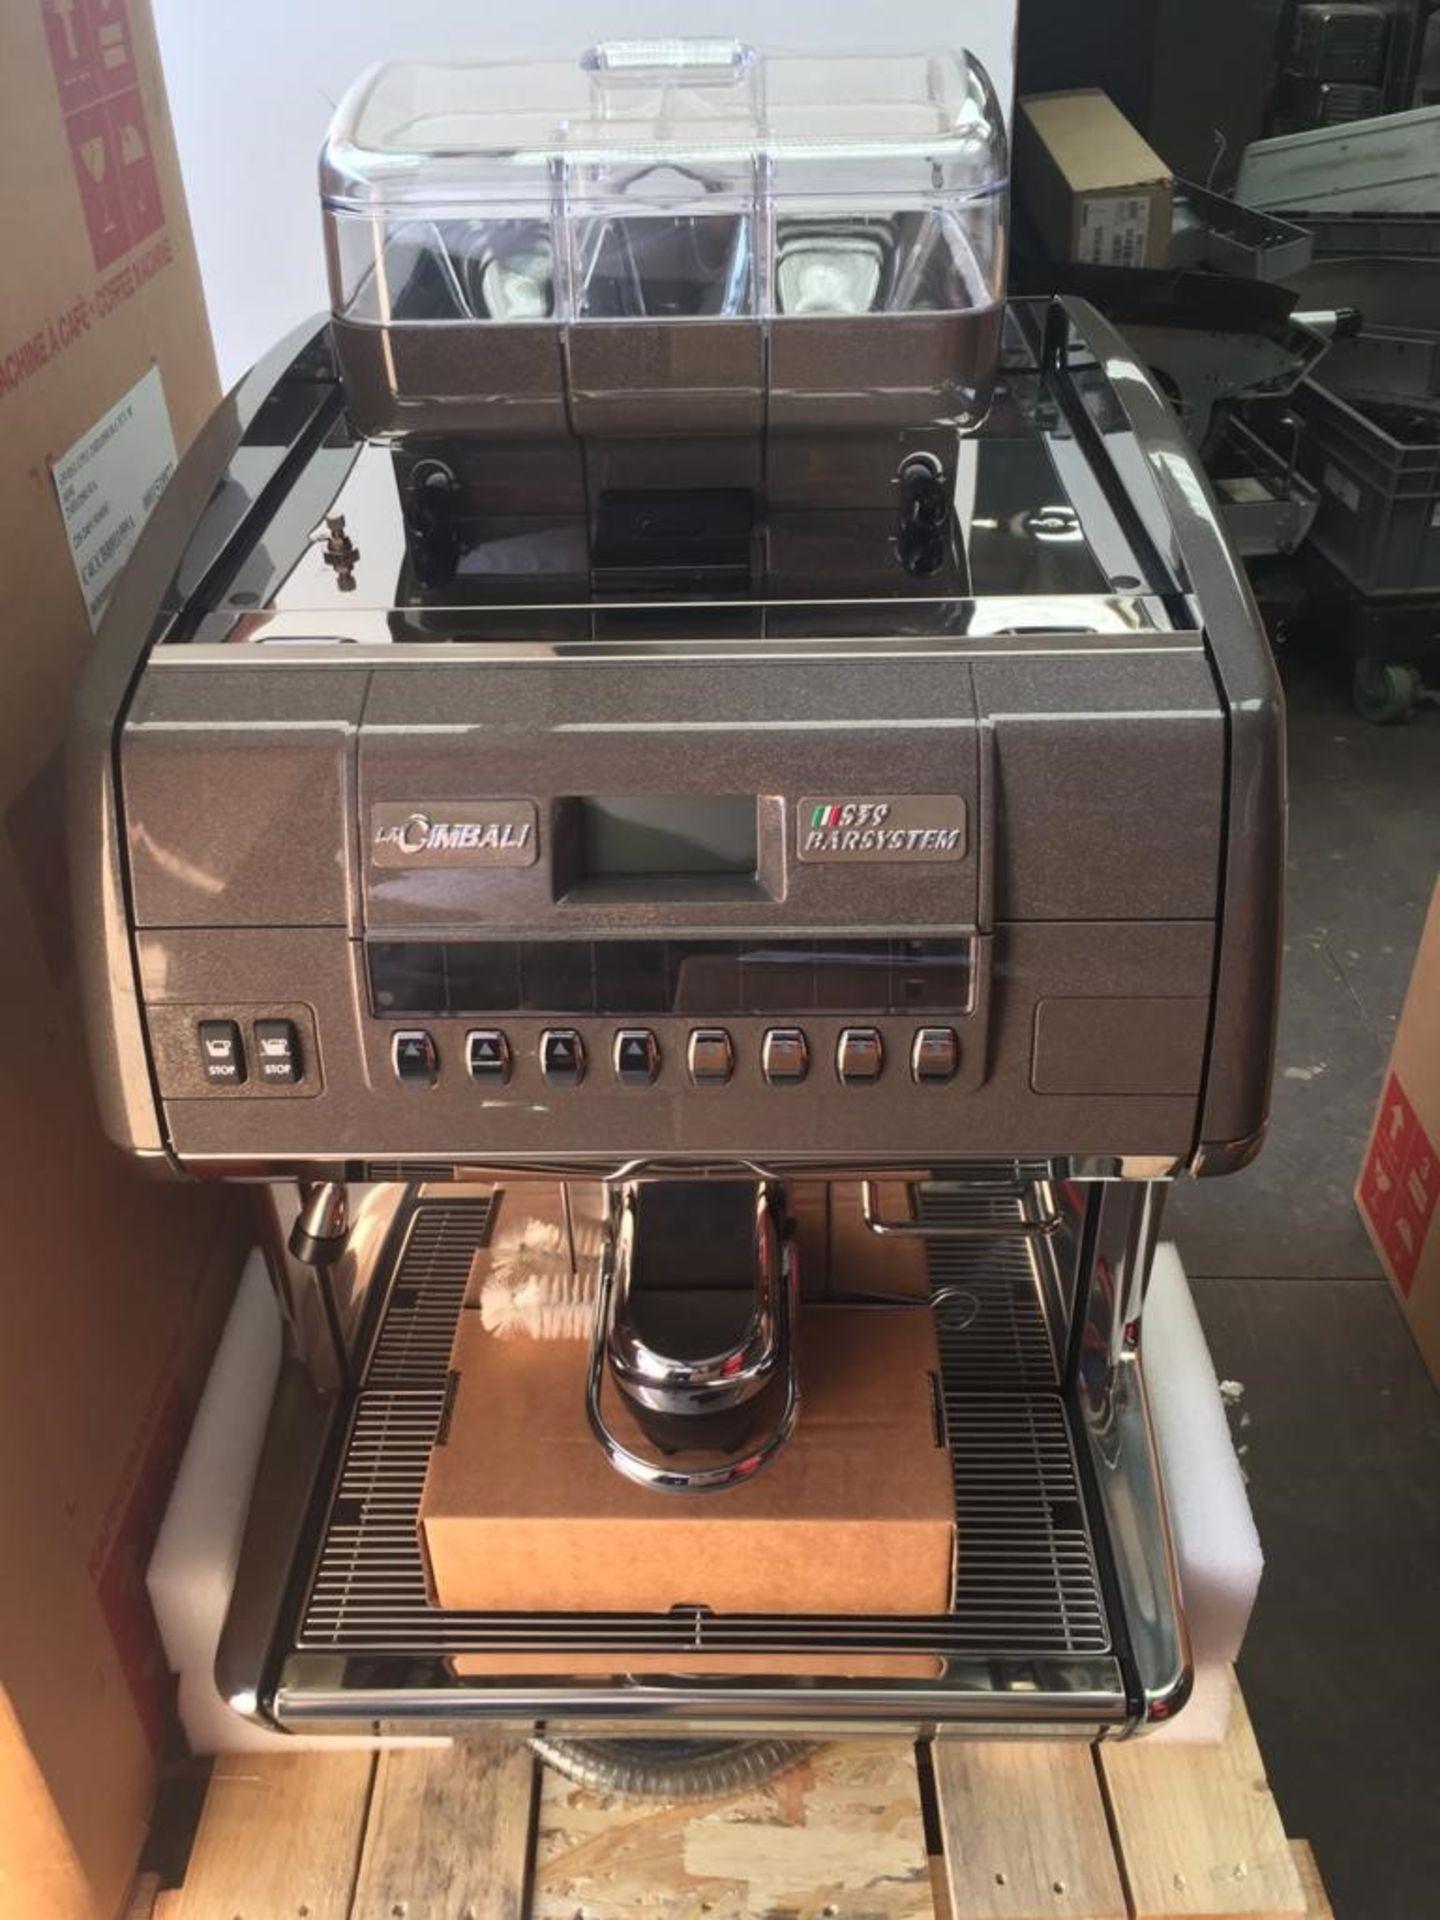 Unused La Cimbali Commercial Coffee Machine - Image 5 of 5